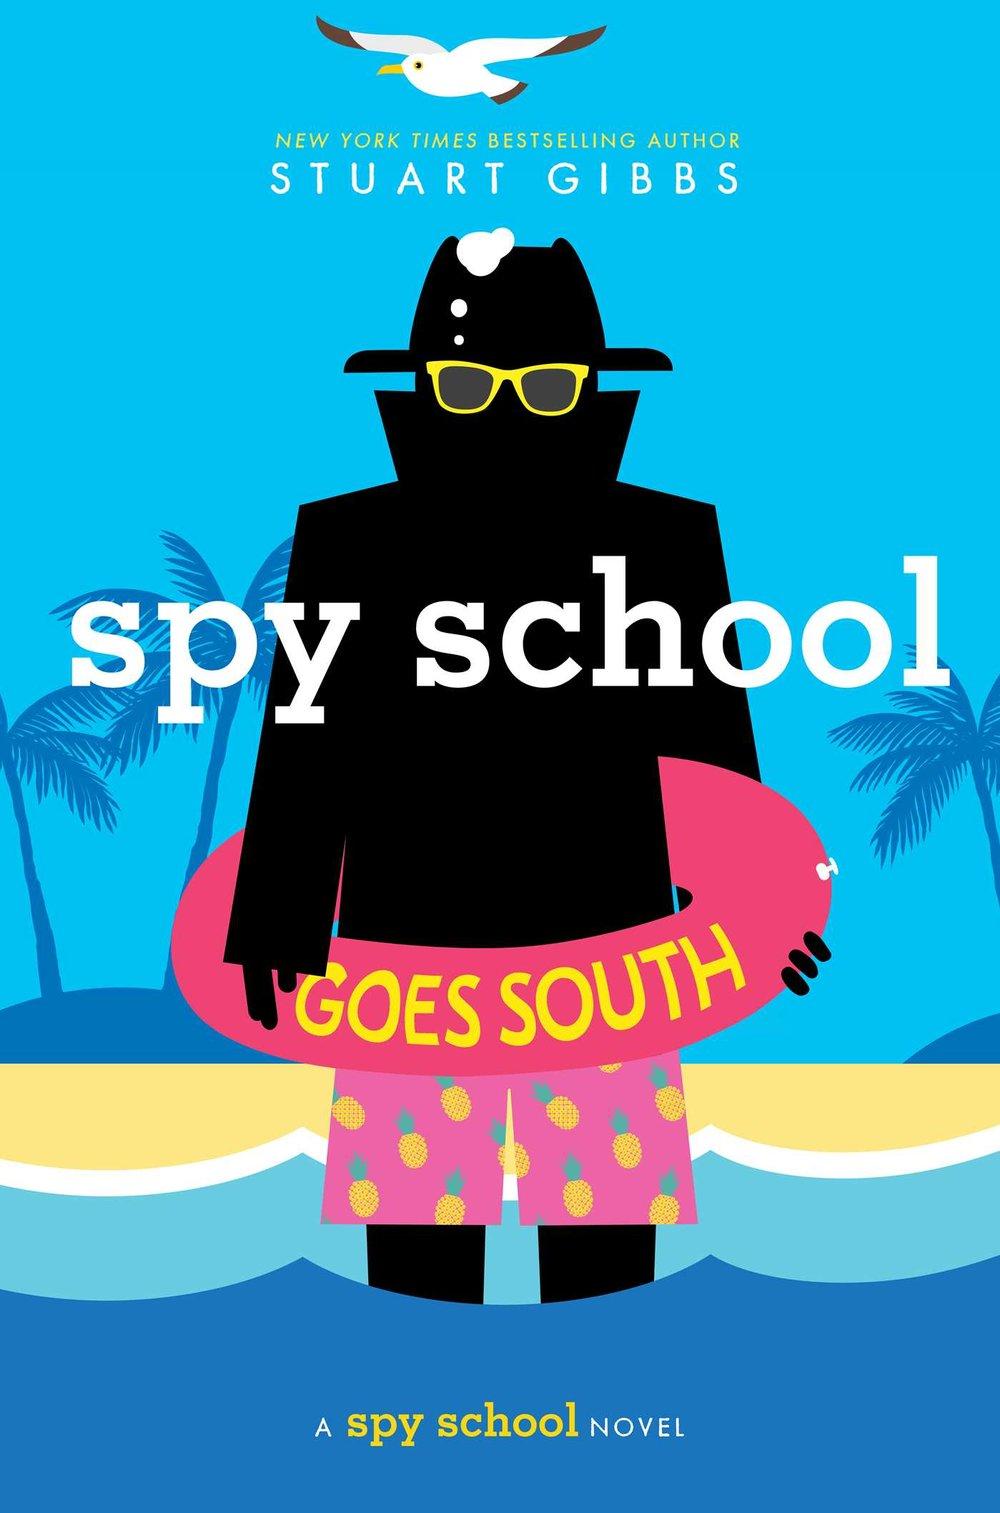 gibbs-spy-school-goes-south.jpg